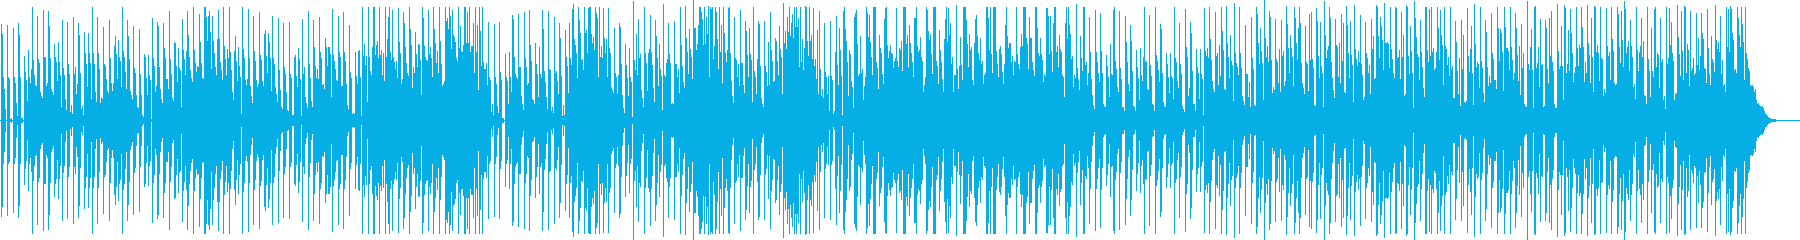 ALTERNATE MIX-高い弦...の再生済みの波形